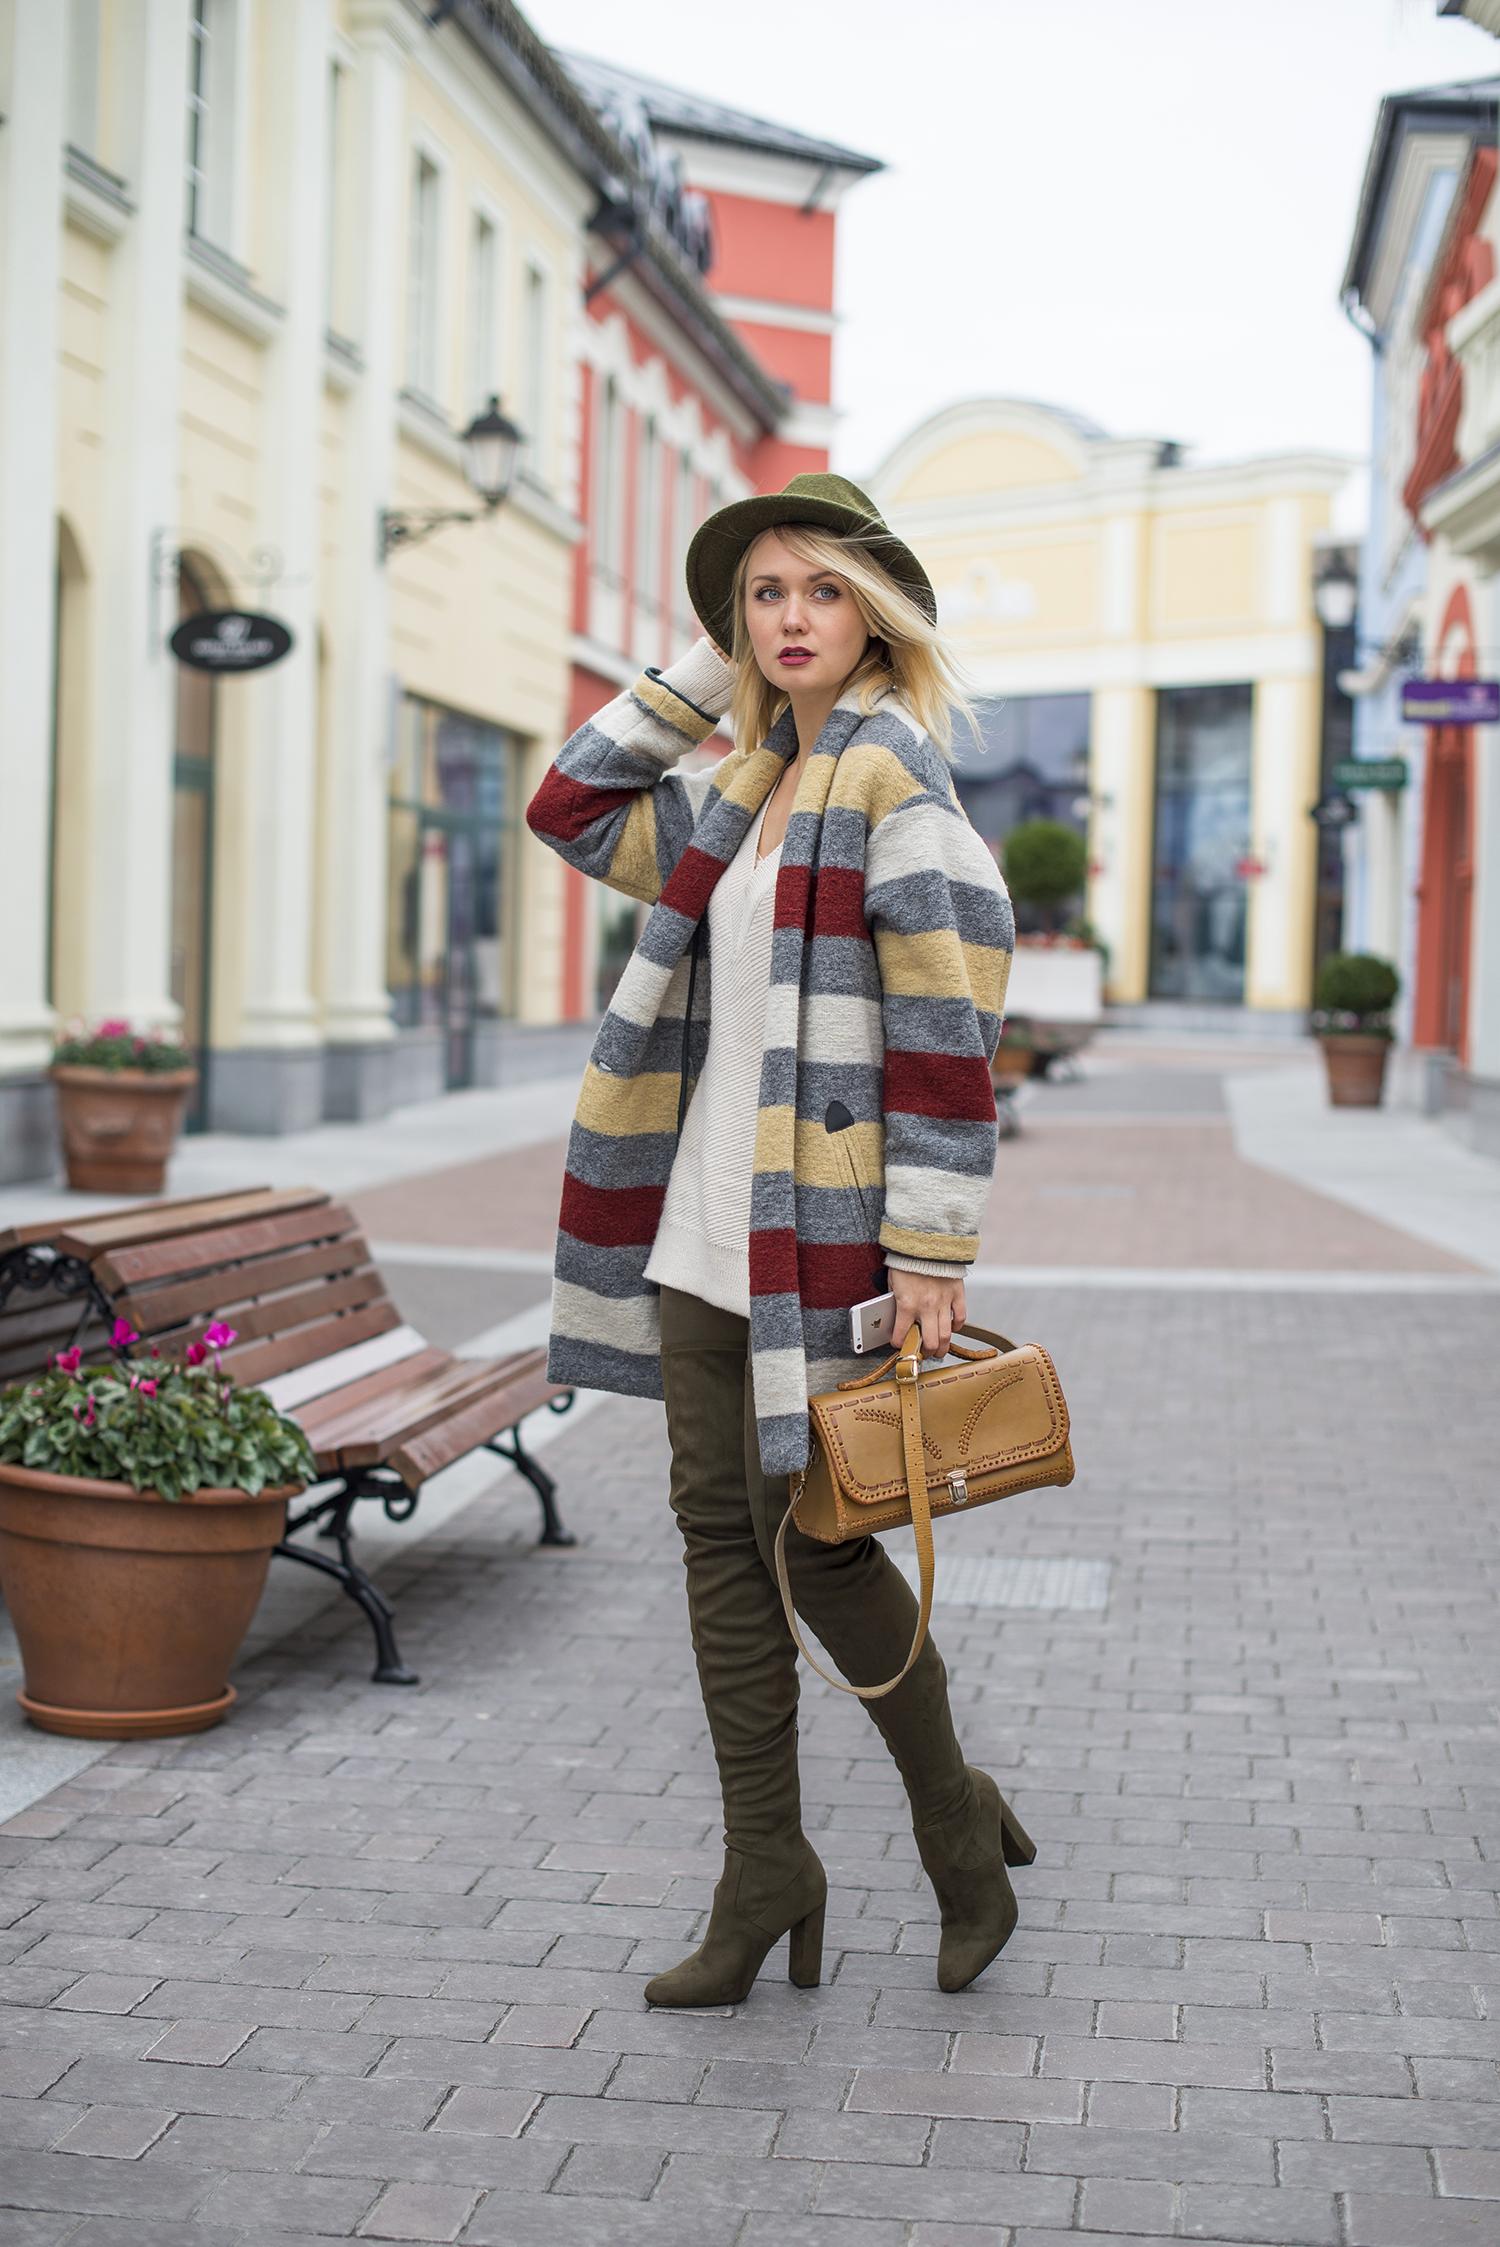 inspiration, streetstyle, autumn outfit, annamidday, top fashion blogger, top russian fashion blogger, фэшн блогер, русский блогер, известный блогер, топовый блогер, russian bloger, top russian blogger, streetfashion, russian fashion blogger, blogger, fashion, style, fashionista, модный блогер, российский блогер, ТОП блогер, ootd, lookoftheday, look, популярный блогер, российский модный блогер, russian girl, с чем носить ботфорты, осенние цвета, цветовые сочетания, streetstyle, красивая девушка, зеленая шляпа, с чем носить шляпу, Анна миддэй, анна мидэй, luisaviaroma, marc cain, ISABEL MARANT ÉTOILE, ISABEL MARANT, Steve madden, ISABEL MARANT ÉTOILE STRIPED BOILED WOOL BLEND COAT, ISABEL MARANT FW 2016-2017, STEVE MADDEN БОТФОРТЫ ИЗ СТРЕТЧ МИКРОФИБРЫ, STEVE MADDEN STRETCH MICROFIBER BOOTS, Hessian boots